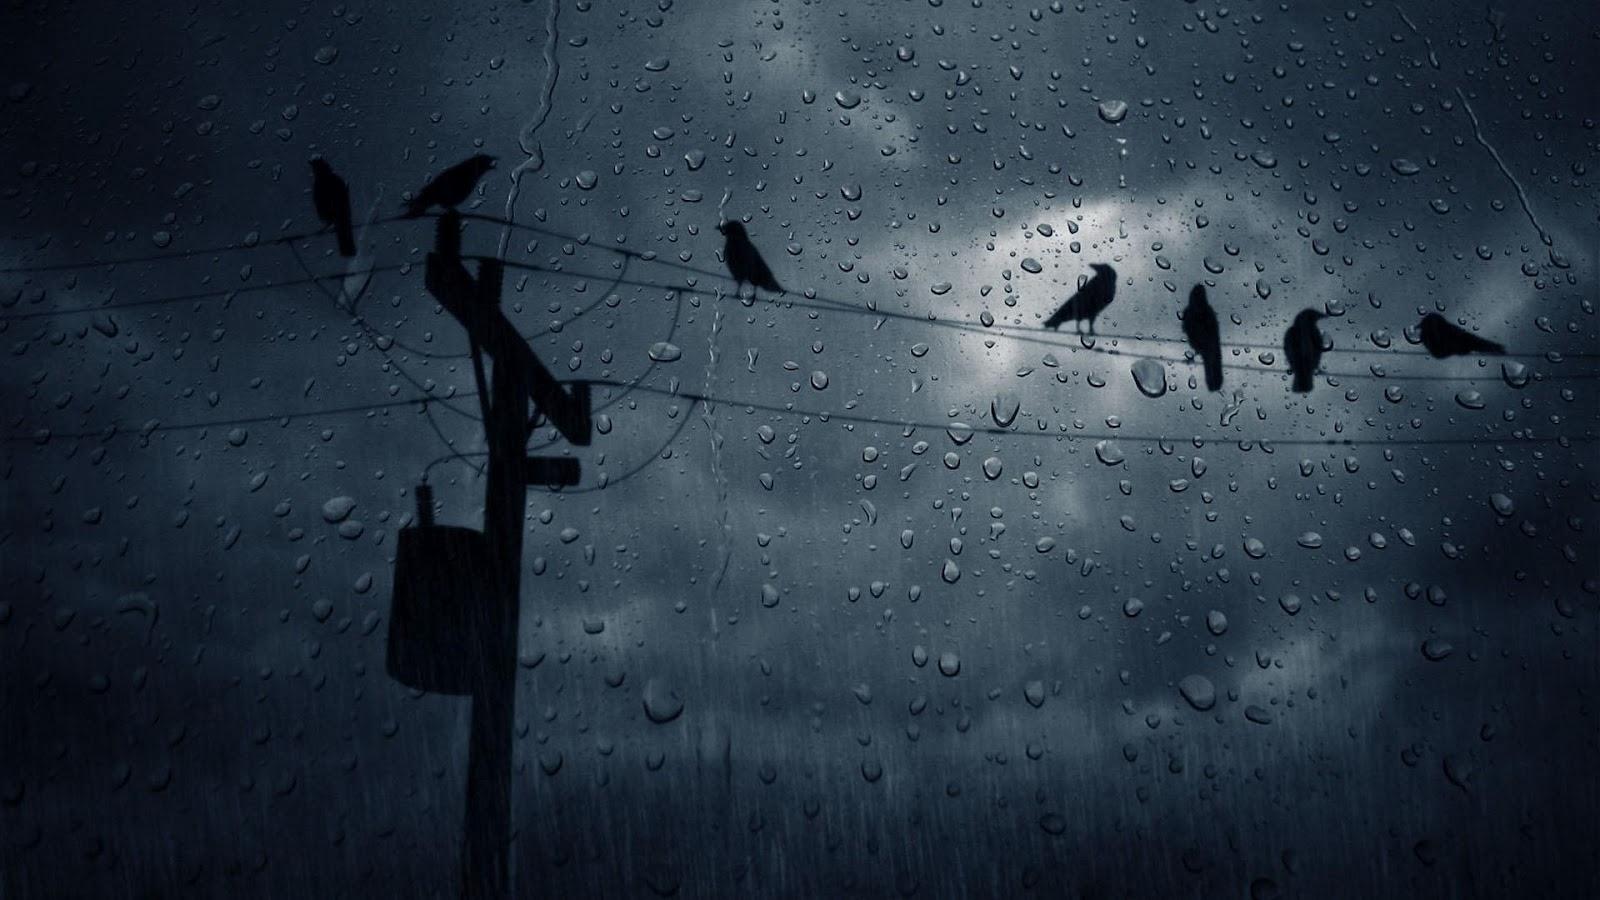 rain rain hd rain hd wallpapers rain hd pics rainy